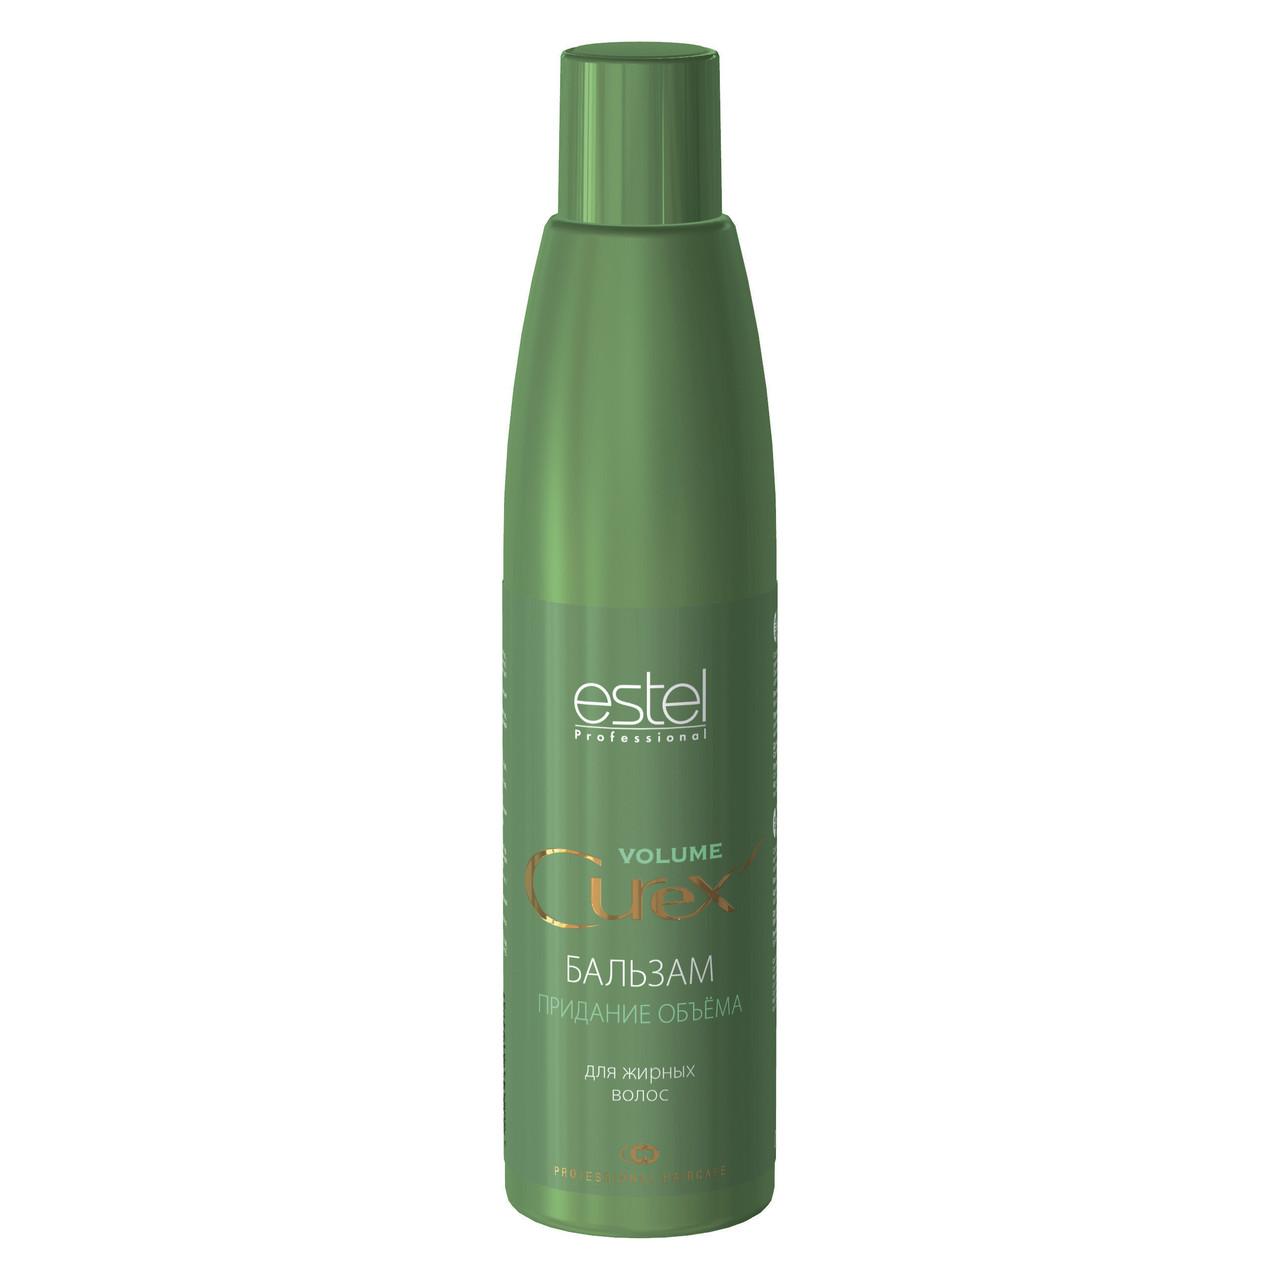 ESTEL CUREX VOLUME Бальзам для надання об'єму для жирного волосся 250 мл